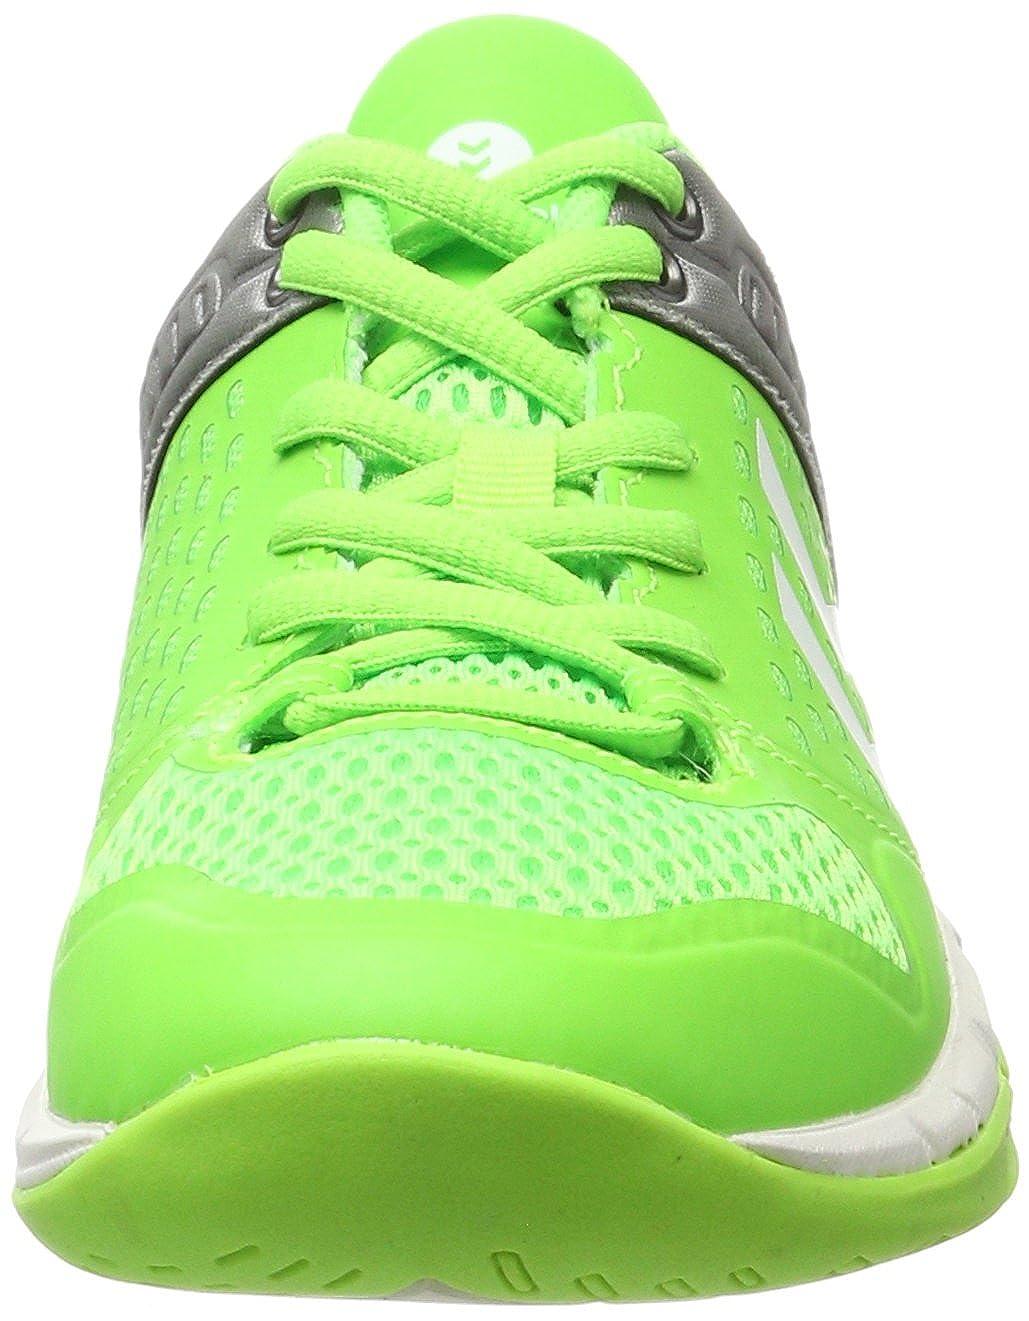 Hummel Omnicourt Z7, Scarpe Sportive Indoor Unisex - Adulto, Verde (Green Gecko), 46.5 EU